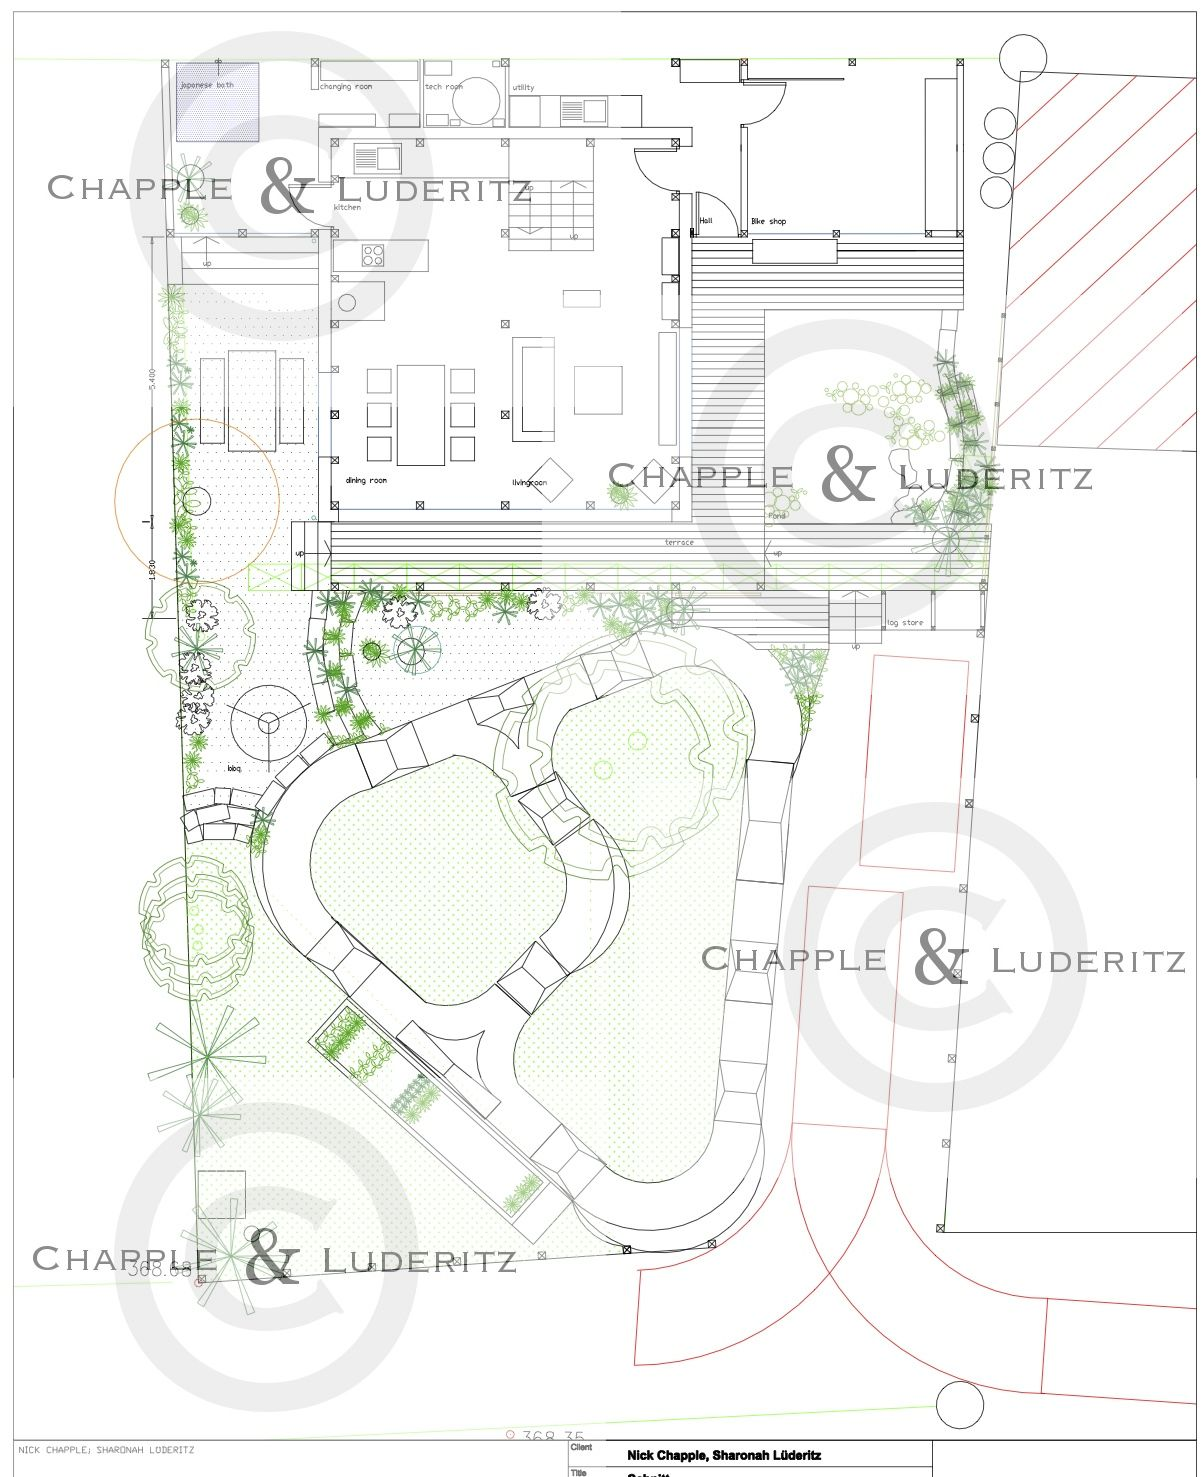 Pump Track Layout Google Search Pinterest Mountain Bike Diagram Landscaped Kids Cycle Kindergartens Parking Storage